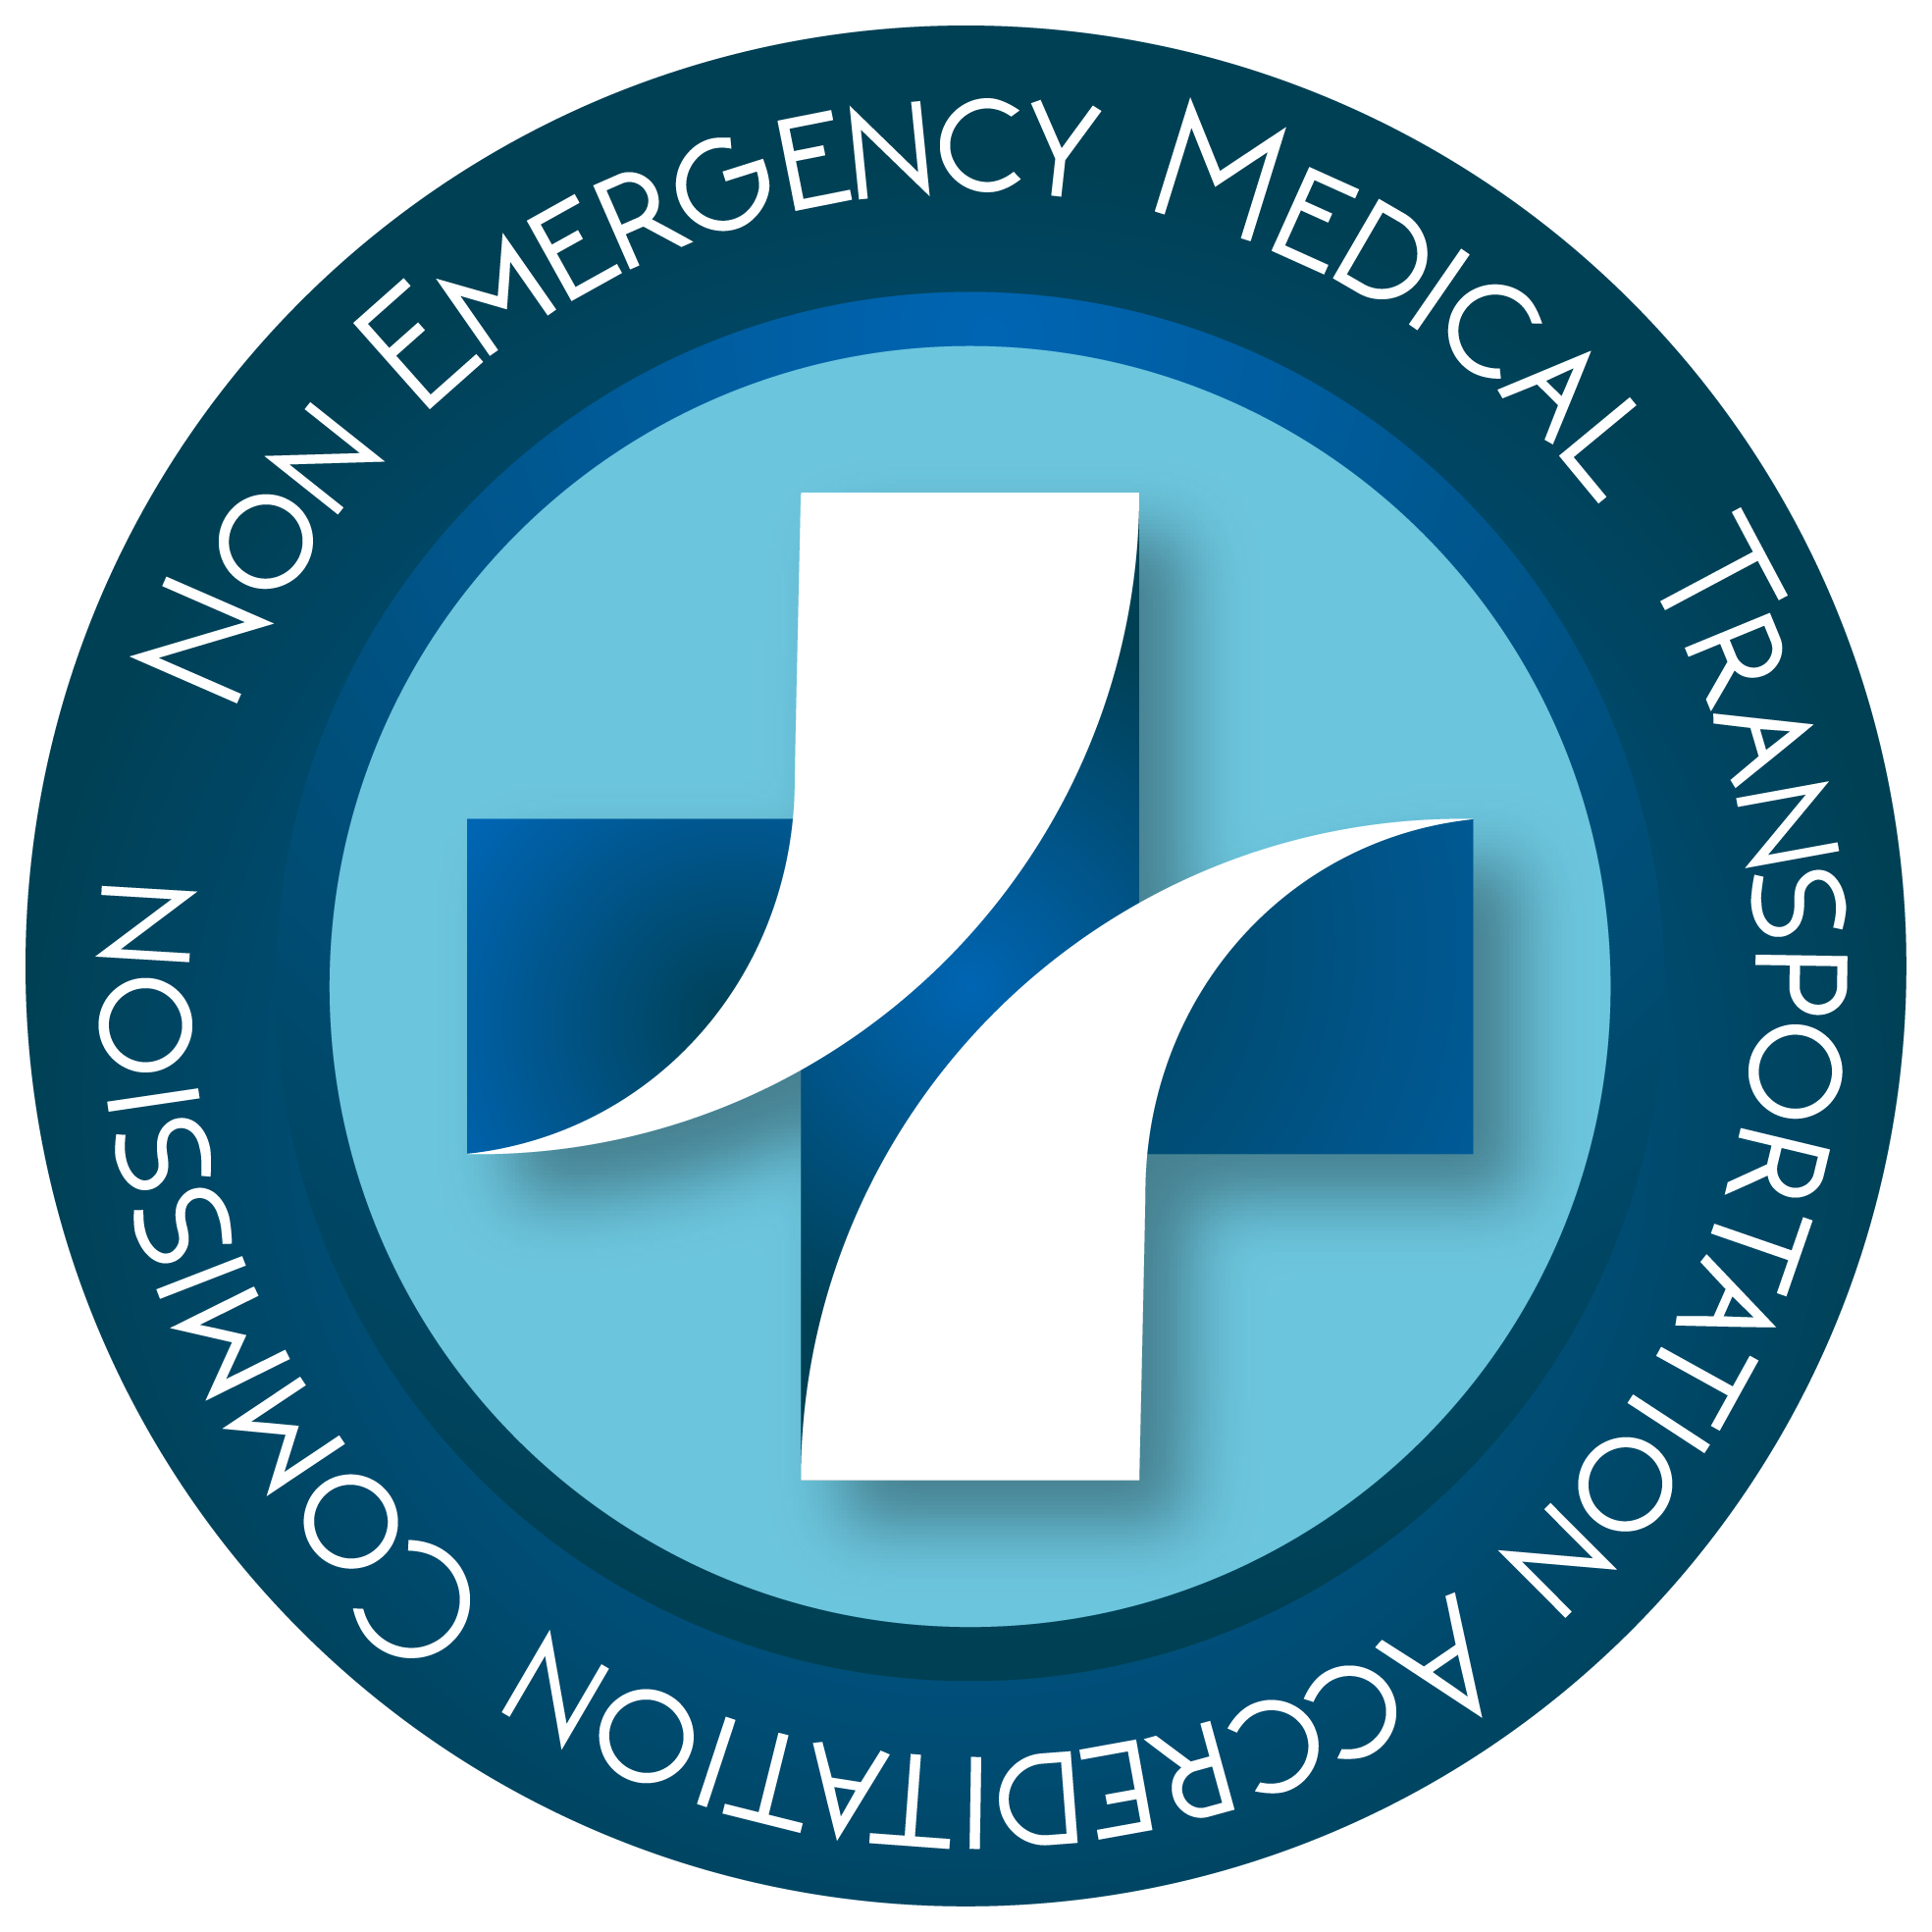 Non Emergency Medical Transportation Accreditation